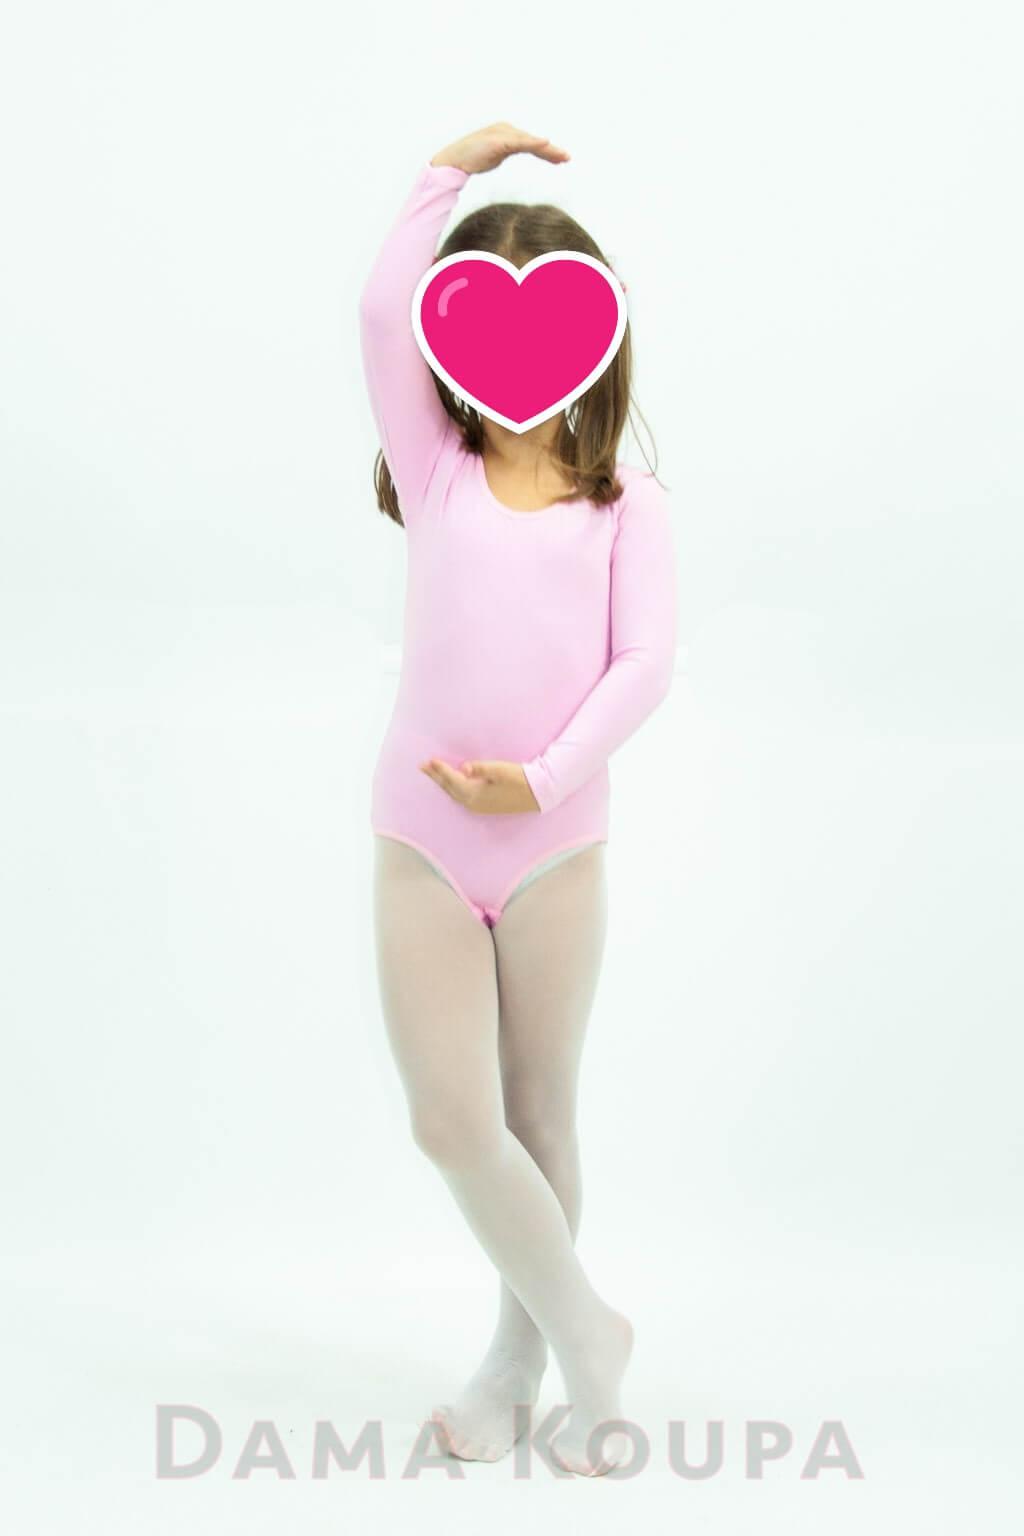 a59aaa16e3f Κορμάκι παιδικό μακρυμάνικο ροζ Dama Koupa